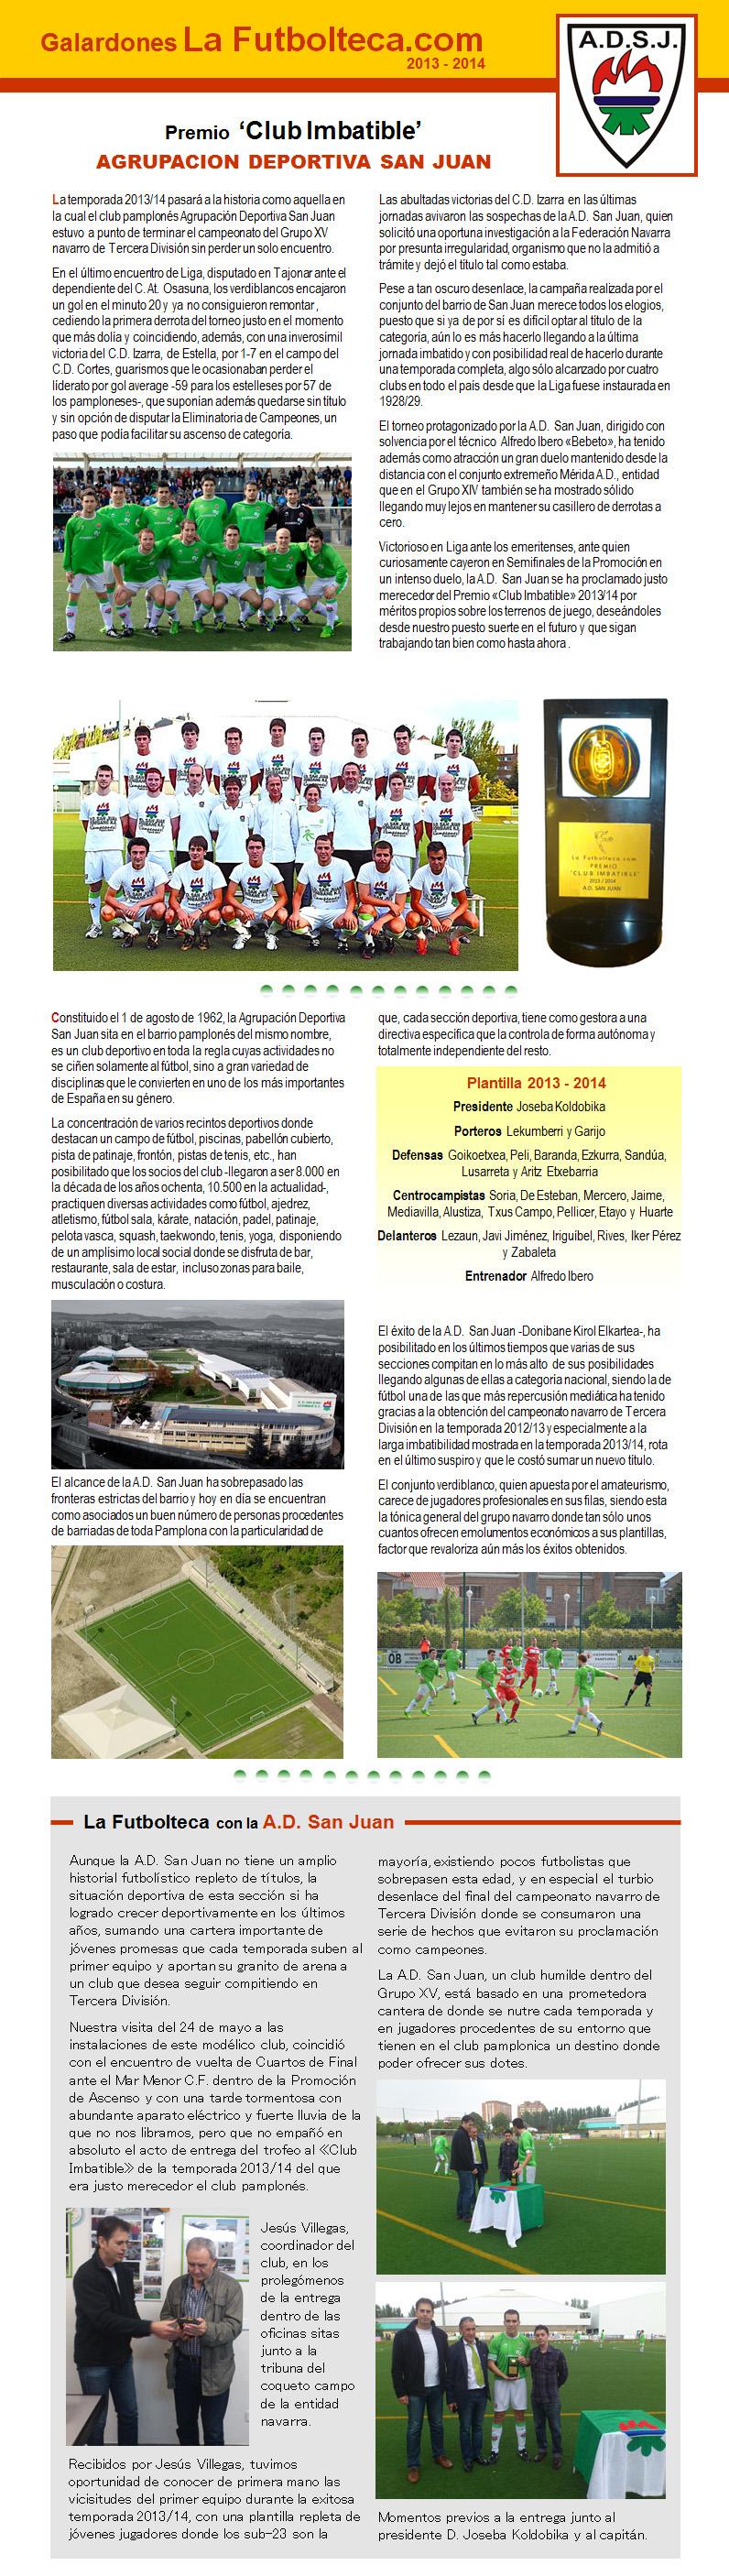 Premio Club Imbatible La Futbolteca 2014